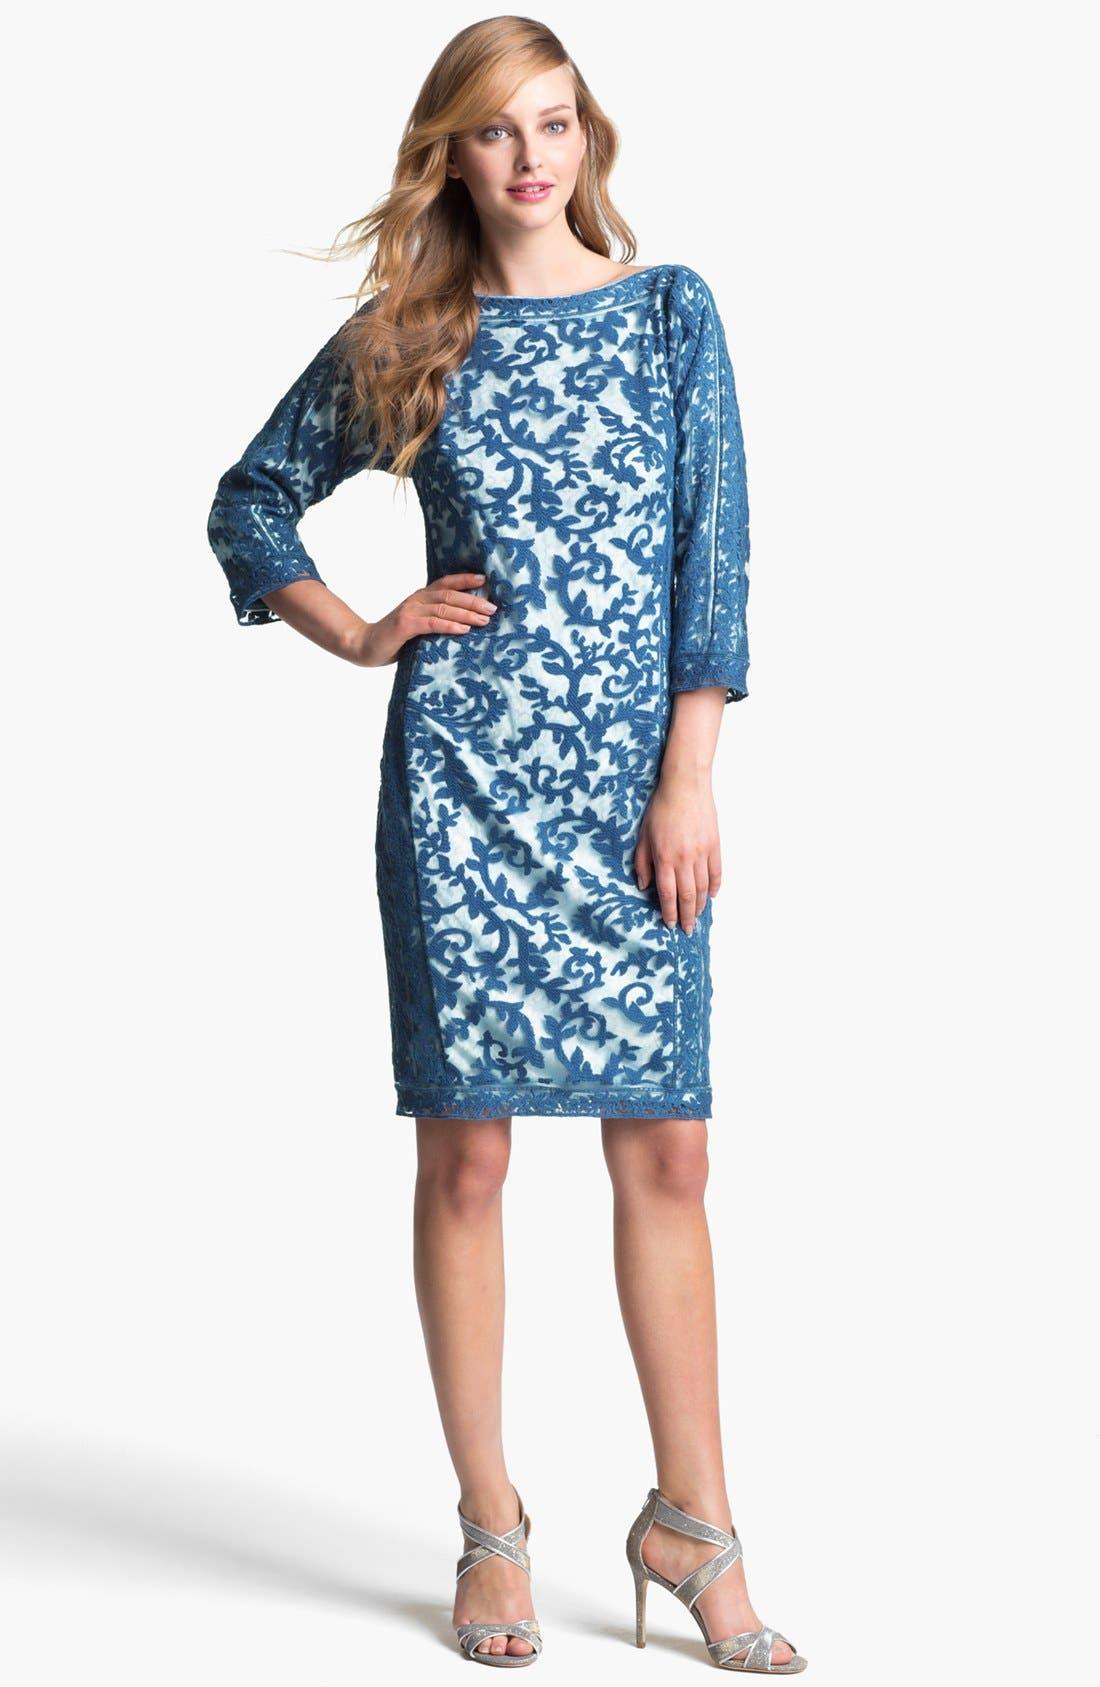 Alternate Image 1 Selected - Tadashi Shoji Embroidered Lace Dress